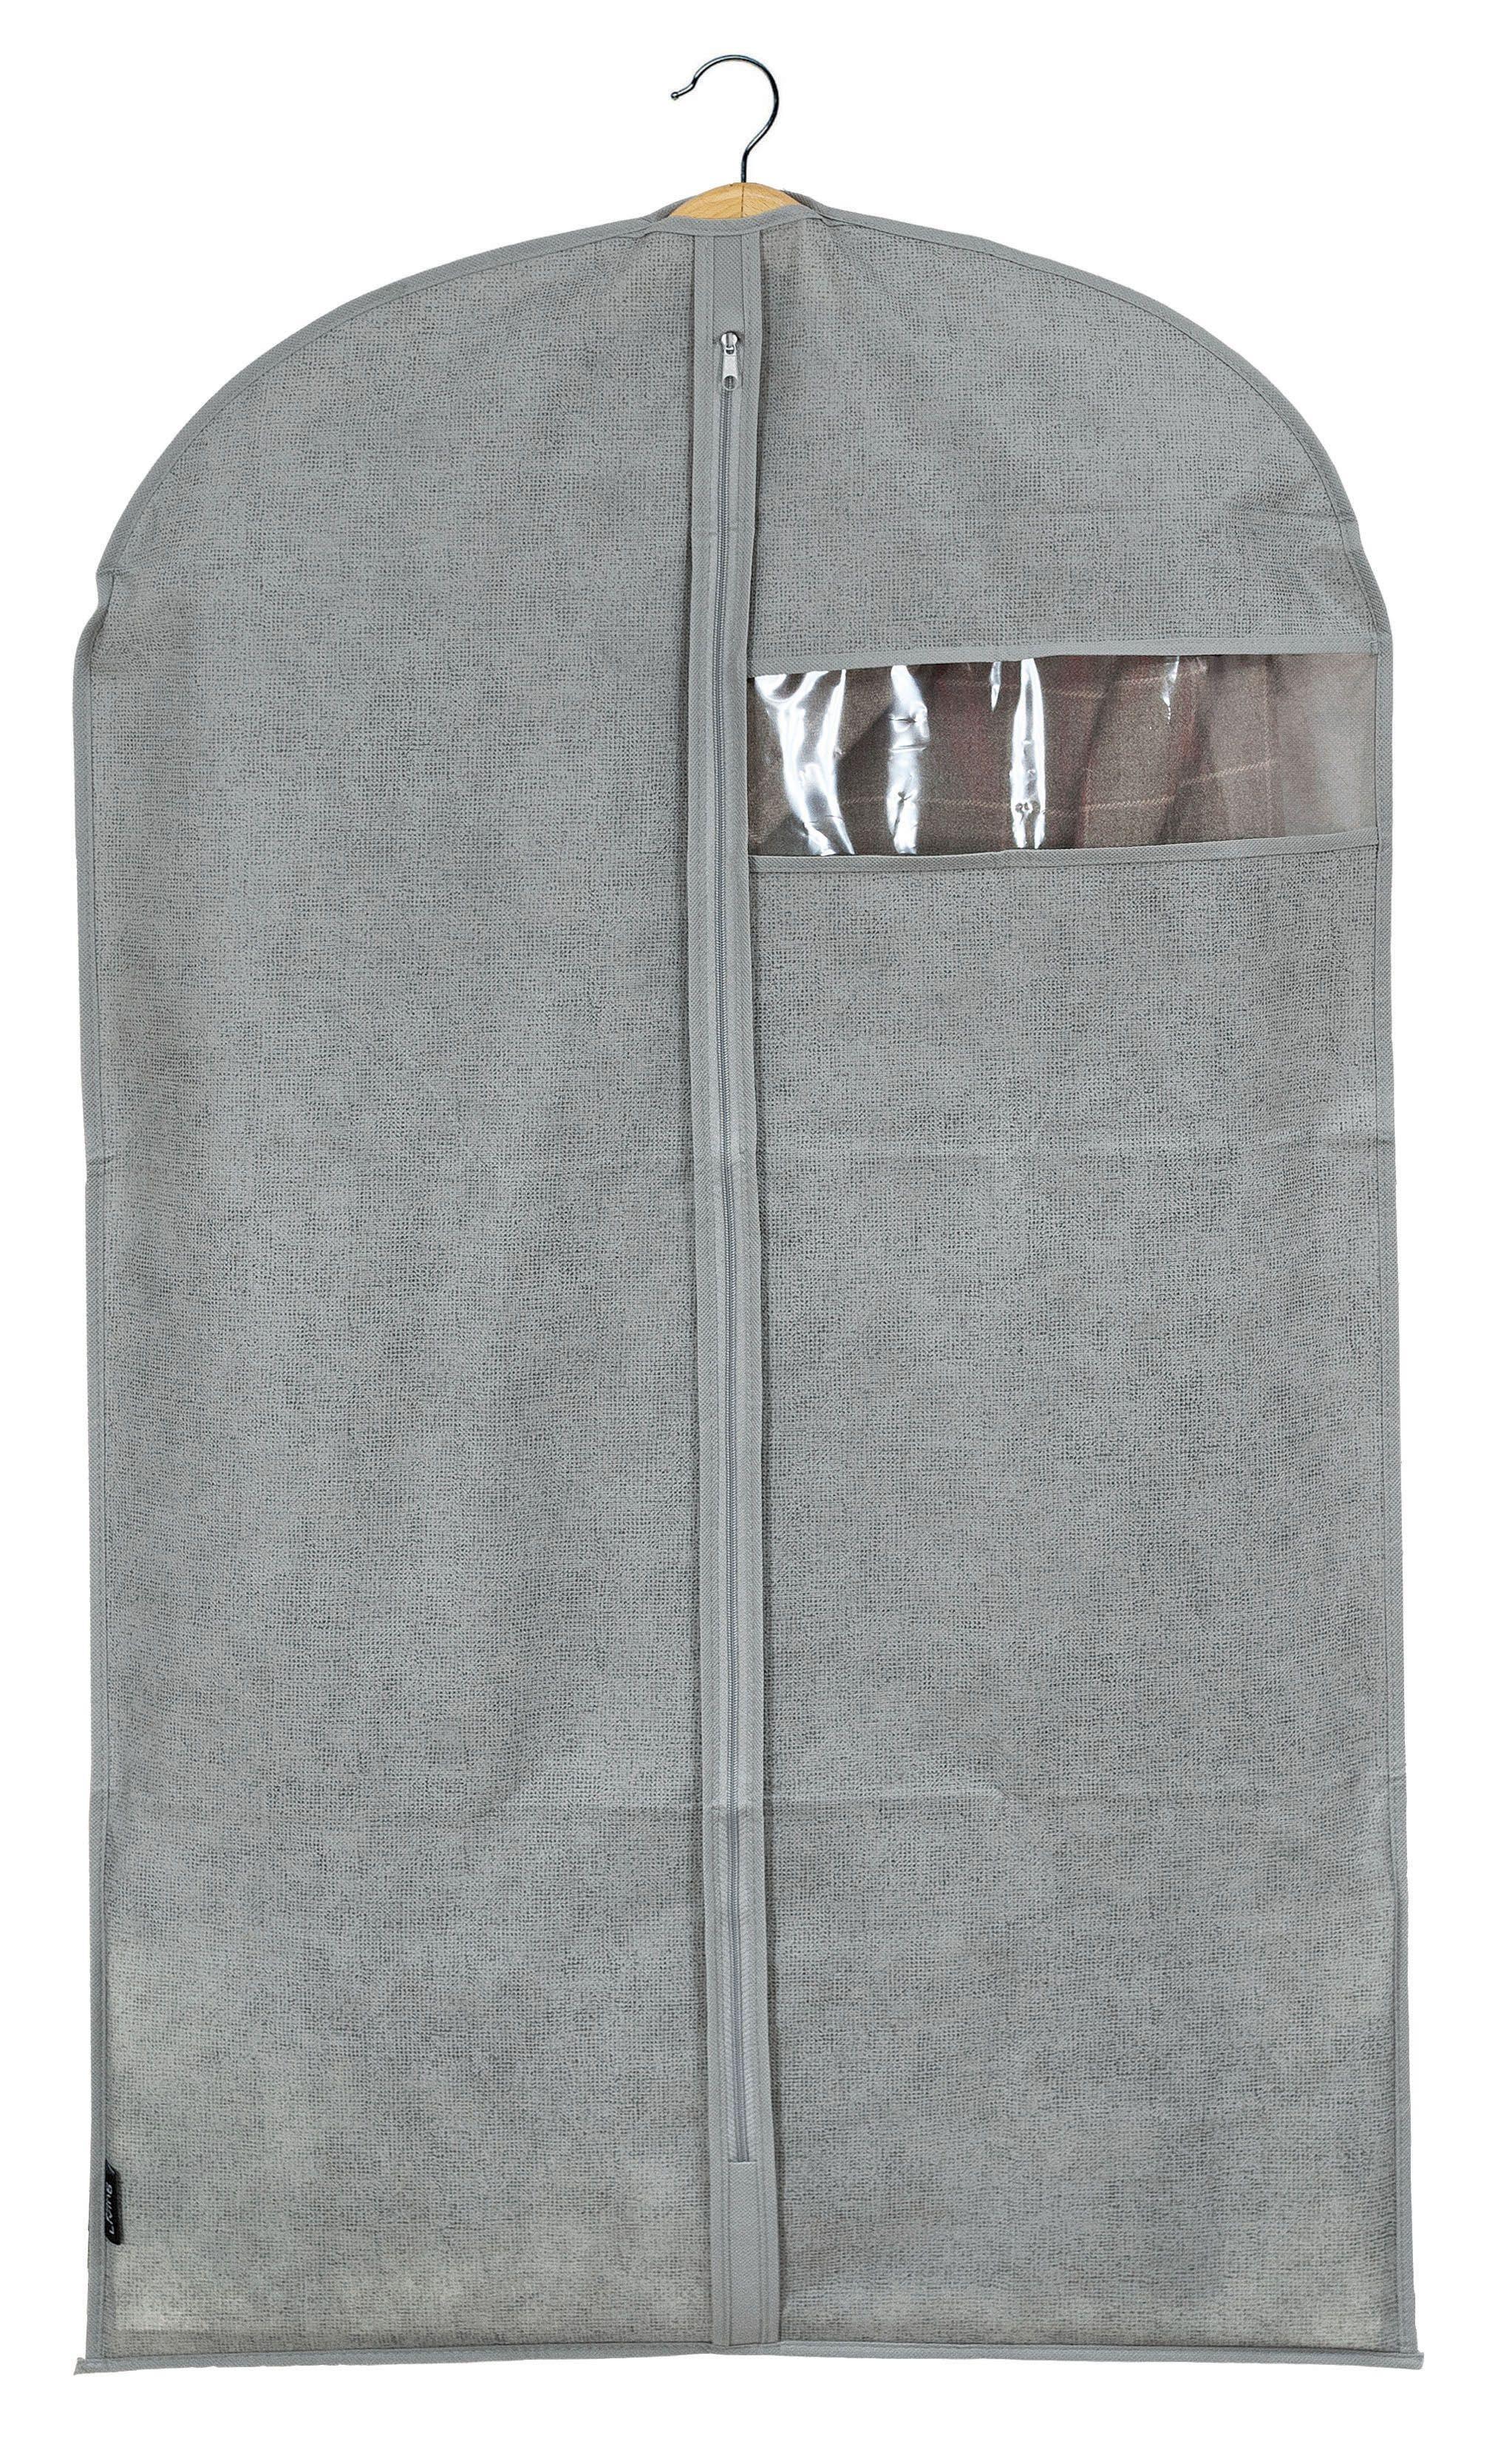 Husa pentru haine cu fermoar, Mais Gri, l60xH100 cm somproduct.ro